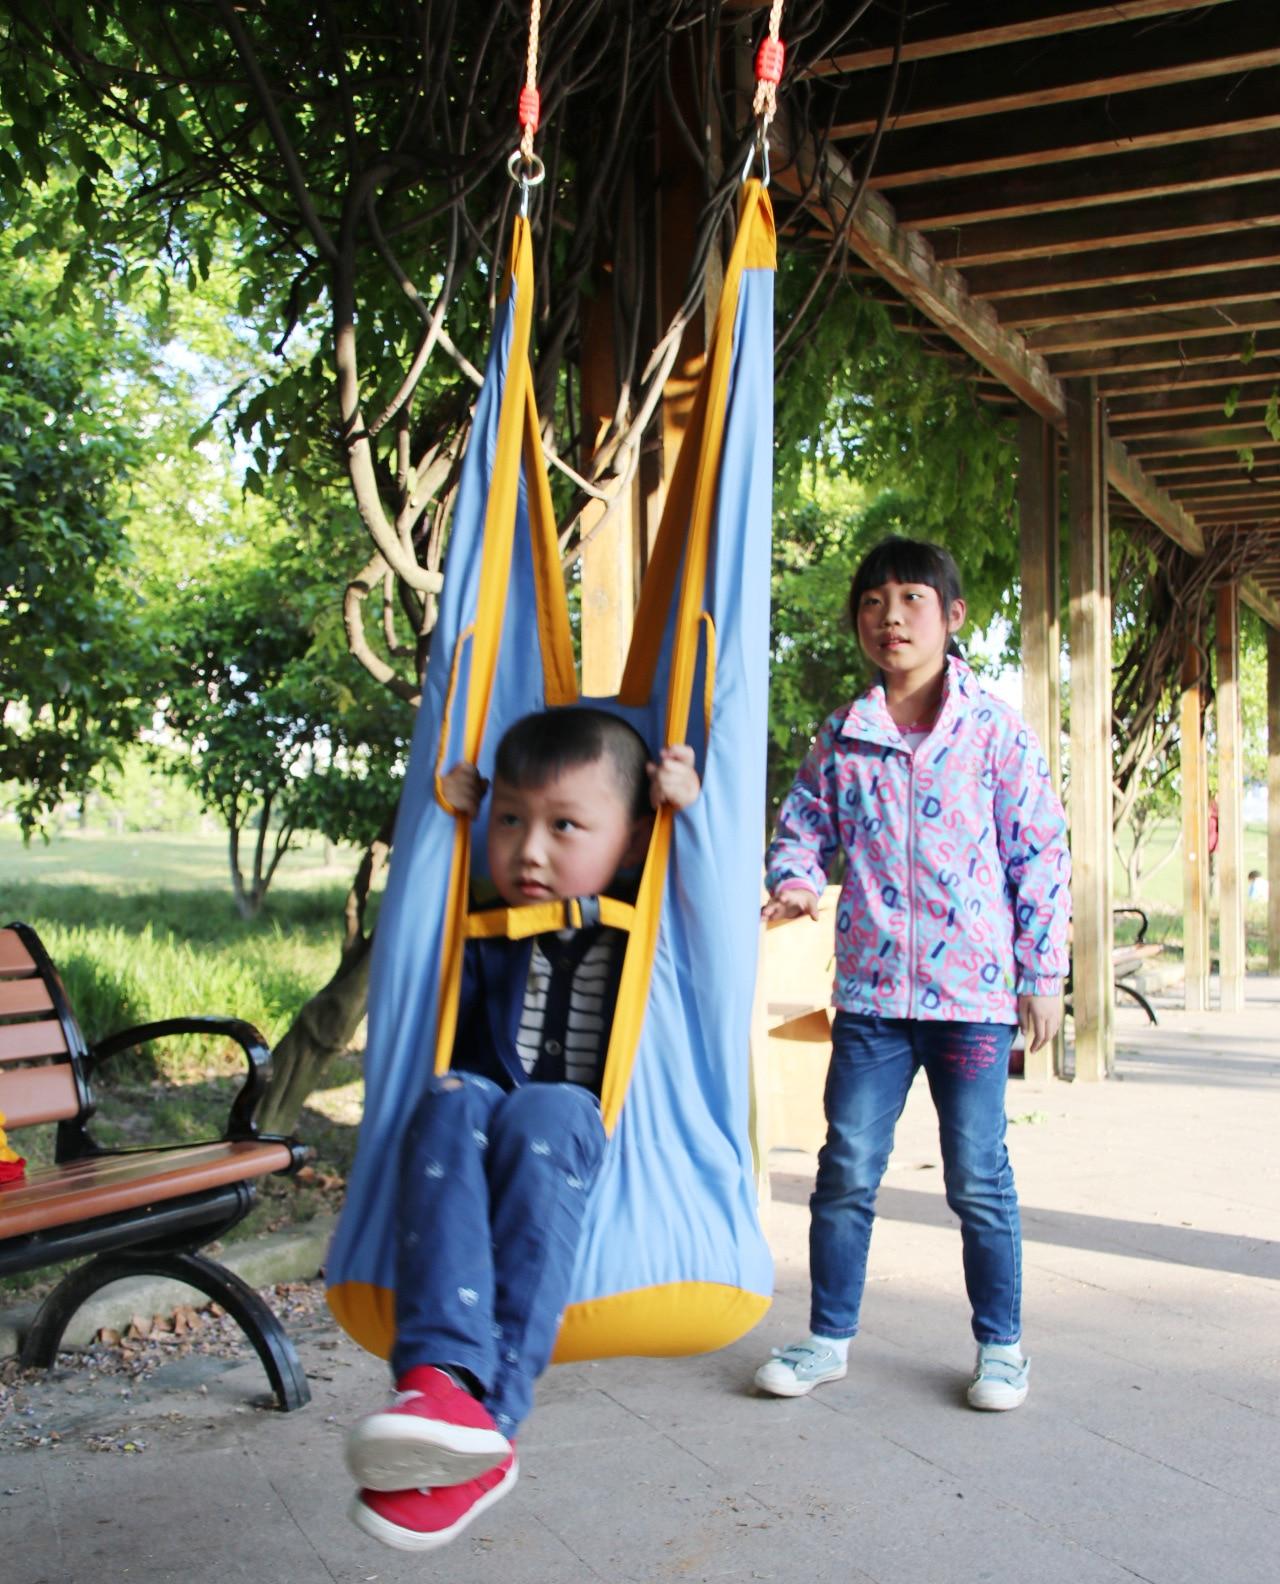 JY77 Outdoor Children Hammock Garden Furniture Swing Chair Indoor Hanging Seat Child Swing Seat Patio Portable Blue Furniture